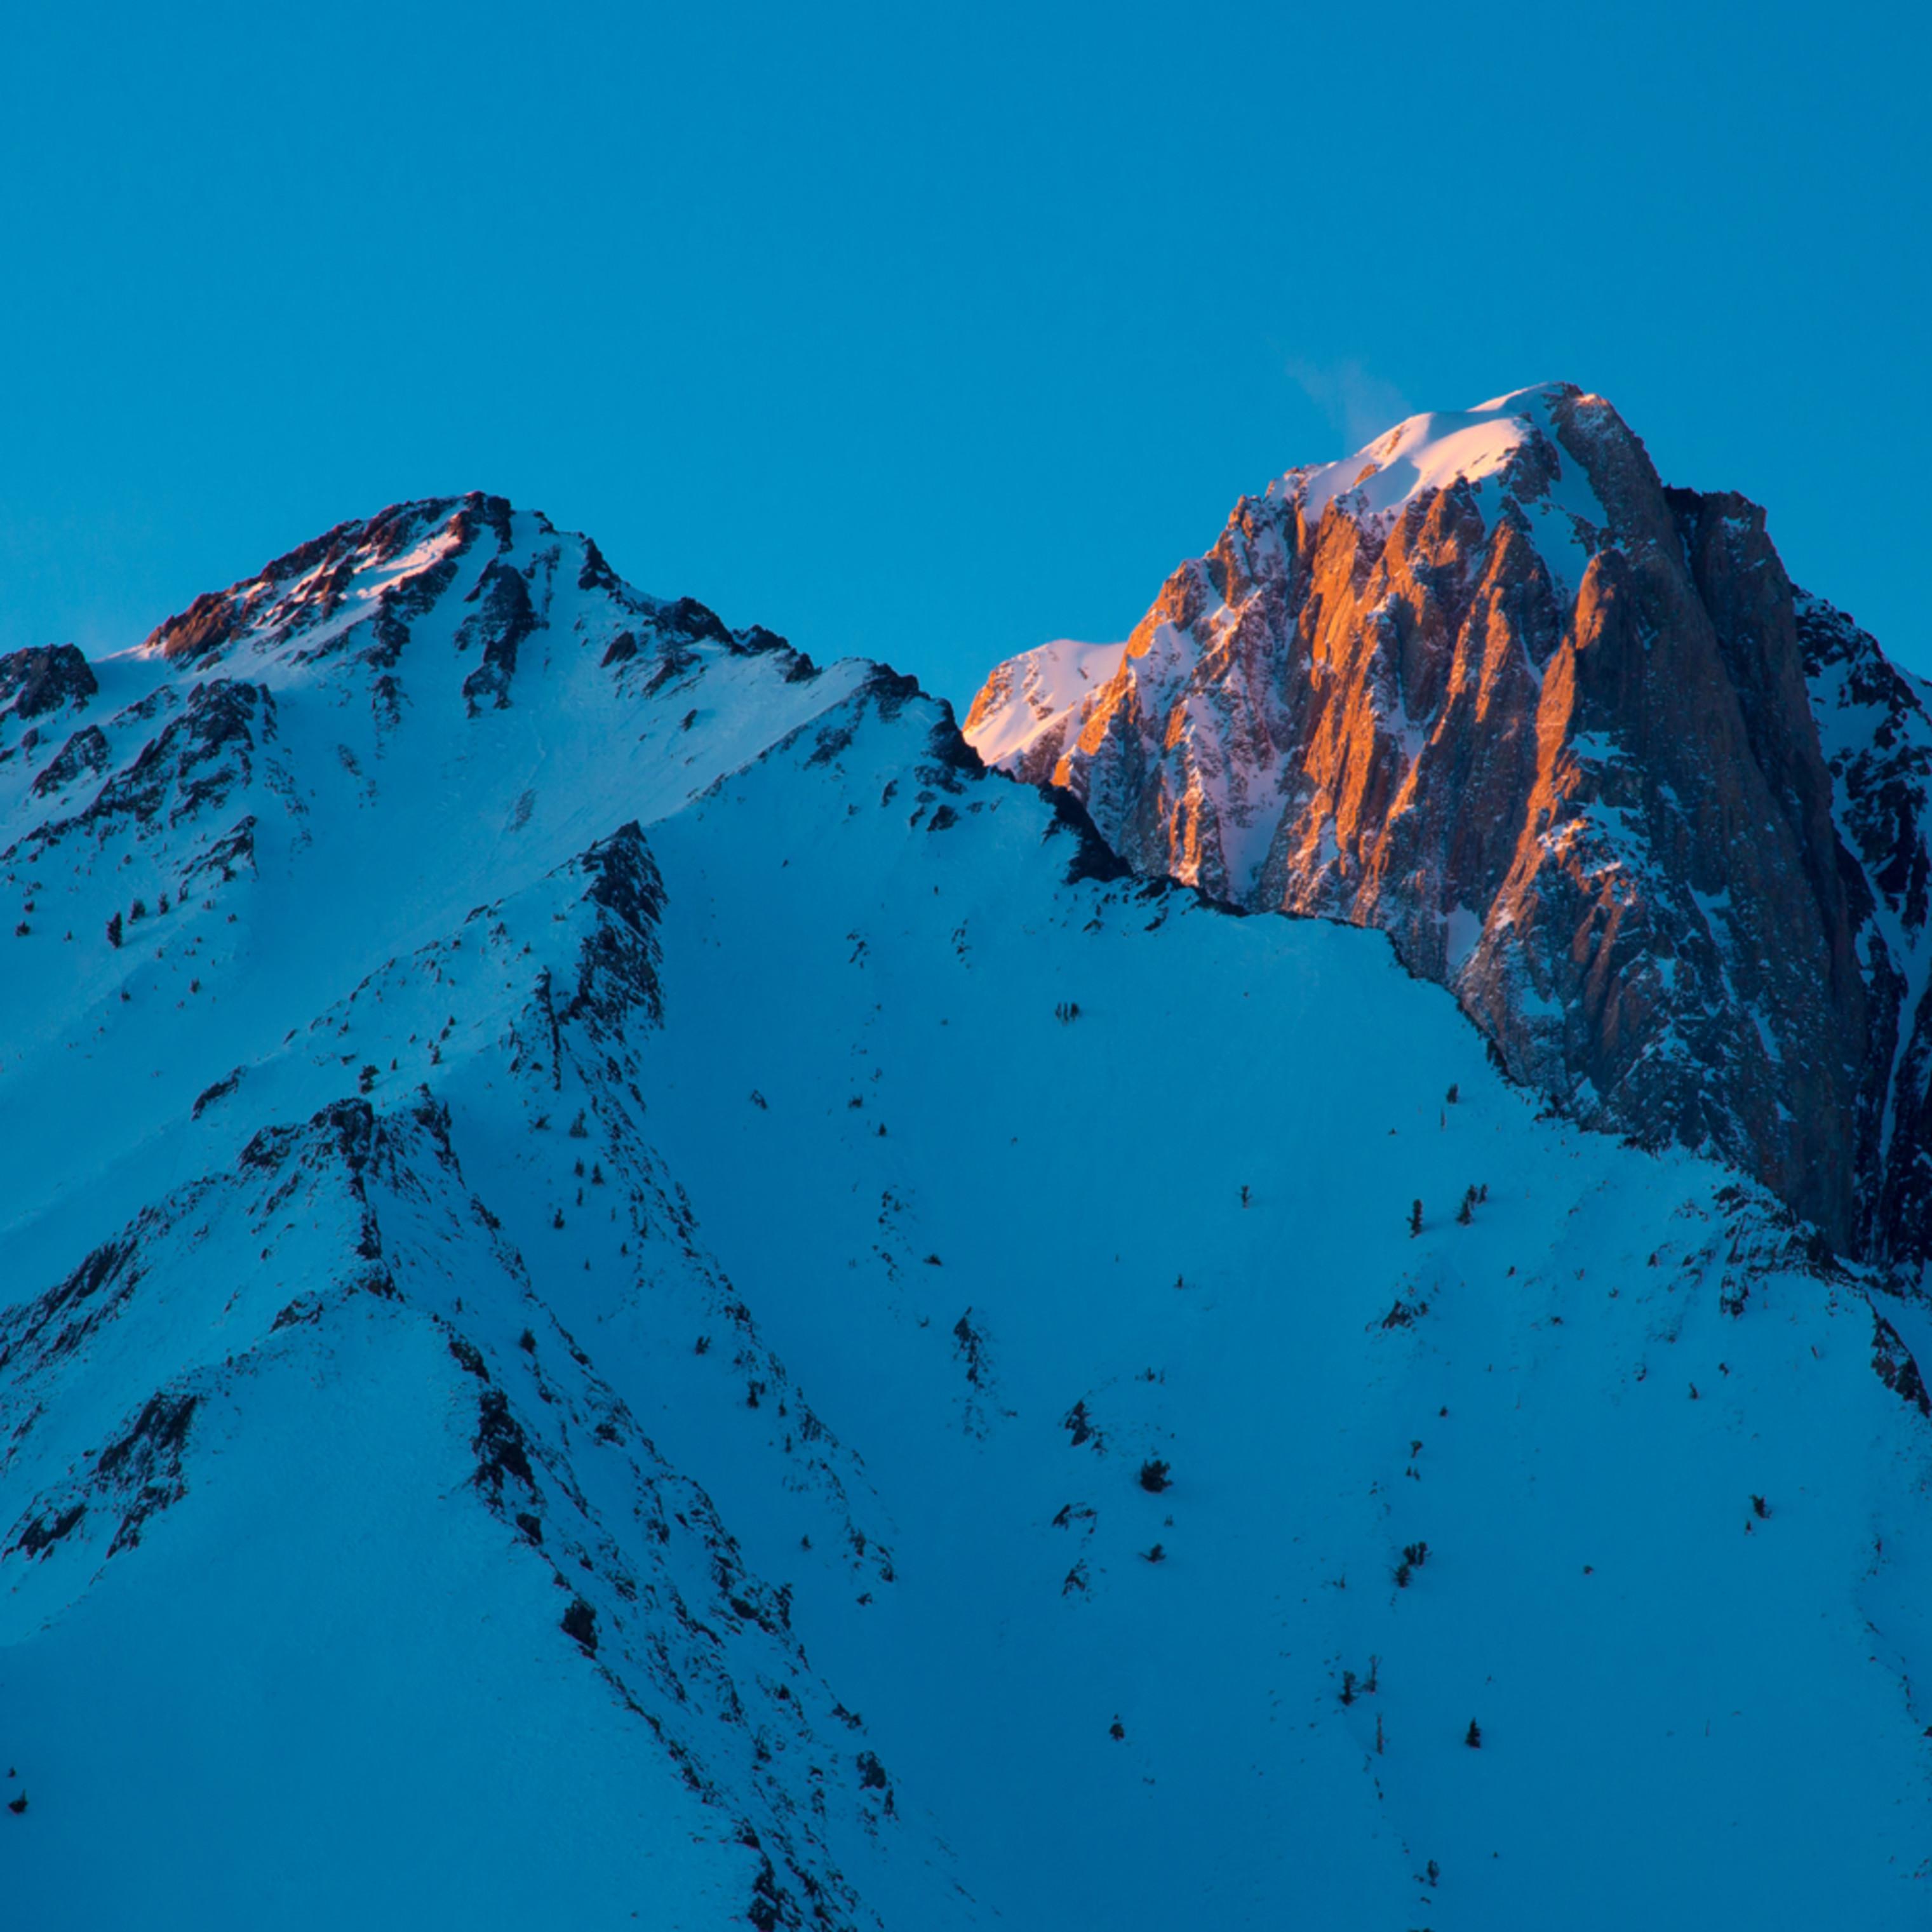 Eastern sierra sunrise3 utn26z